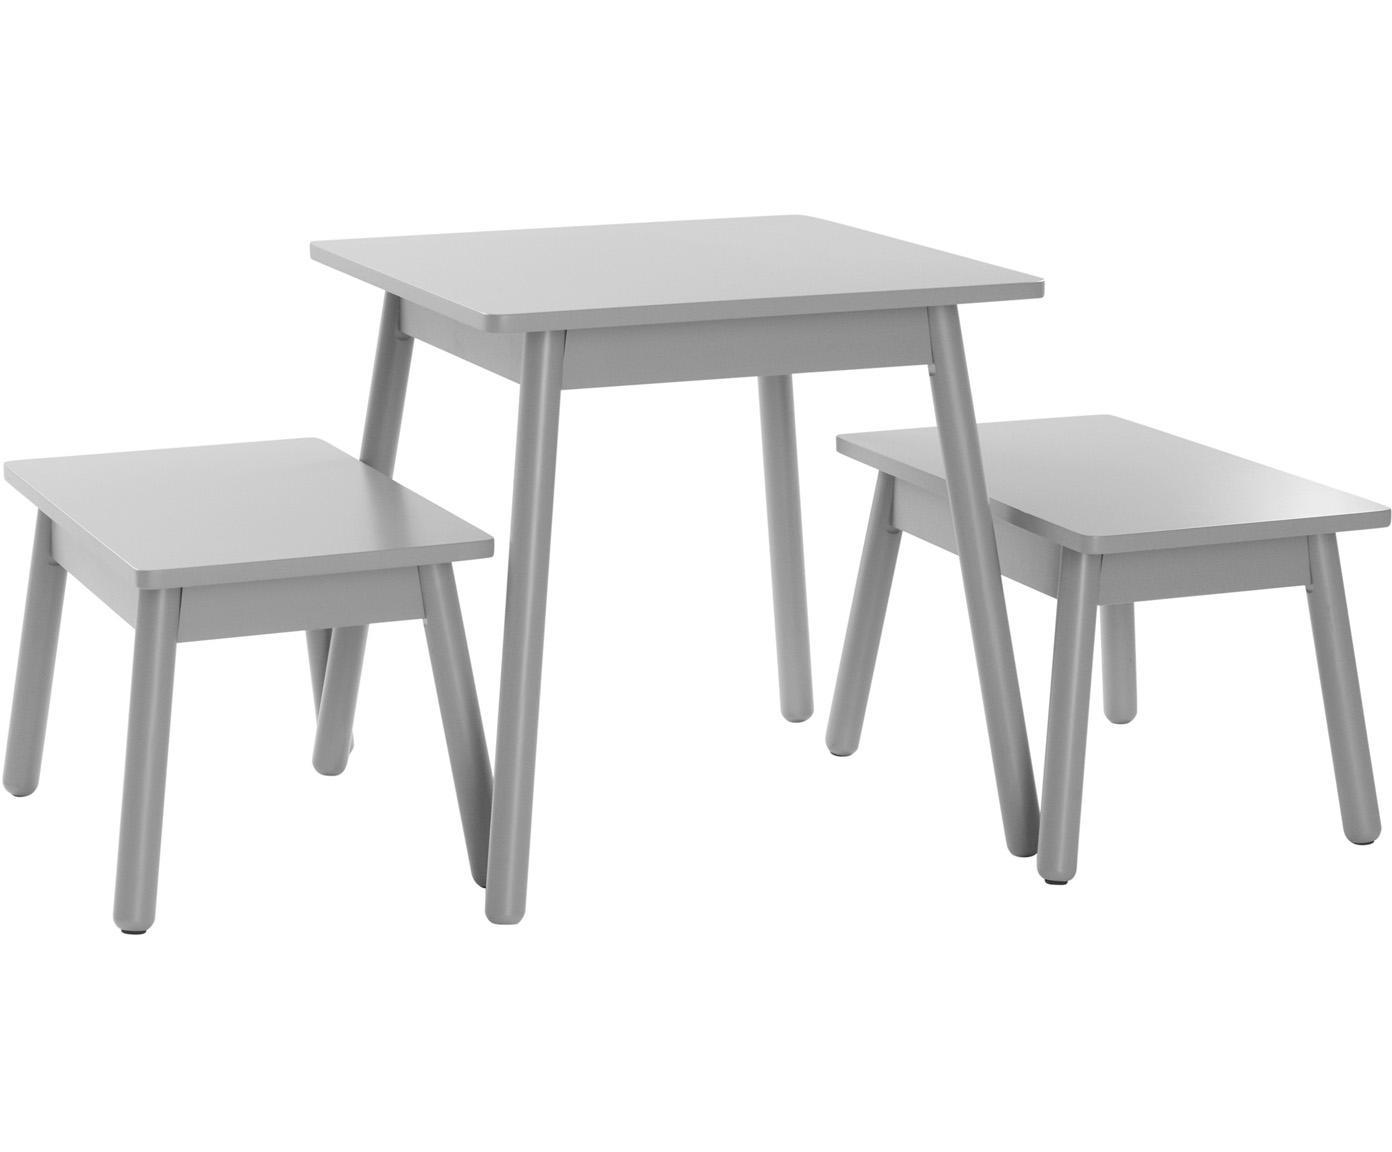 Kindertafelset Kinna Mini, 3-delig, Grenenhout, MDF, Grijs, Verschillende formaten